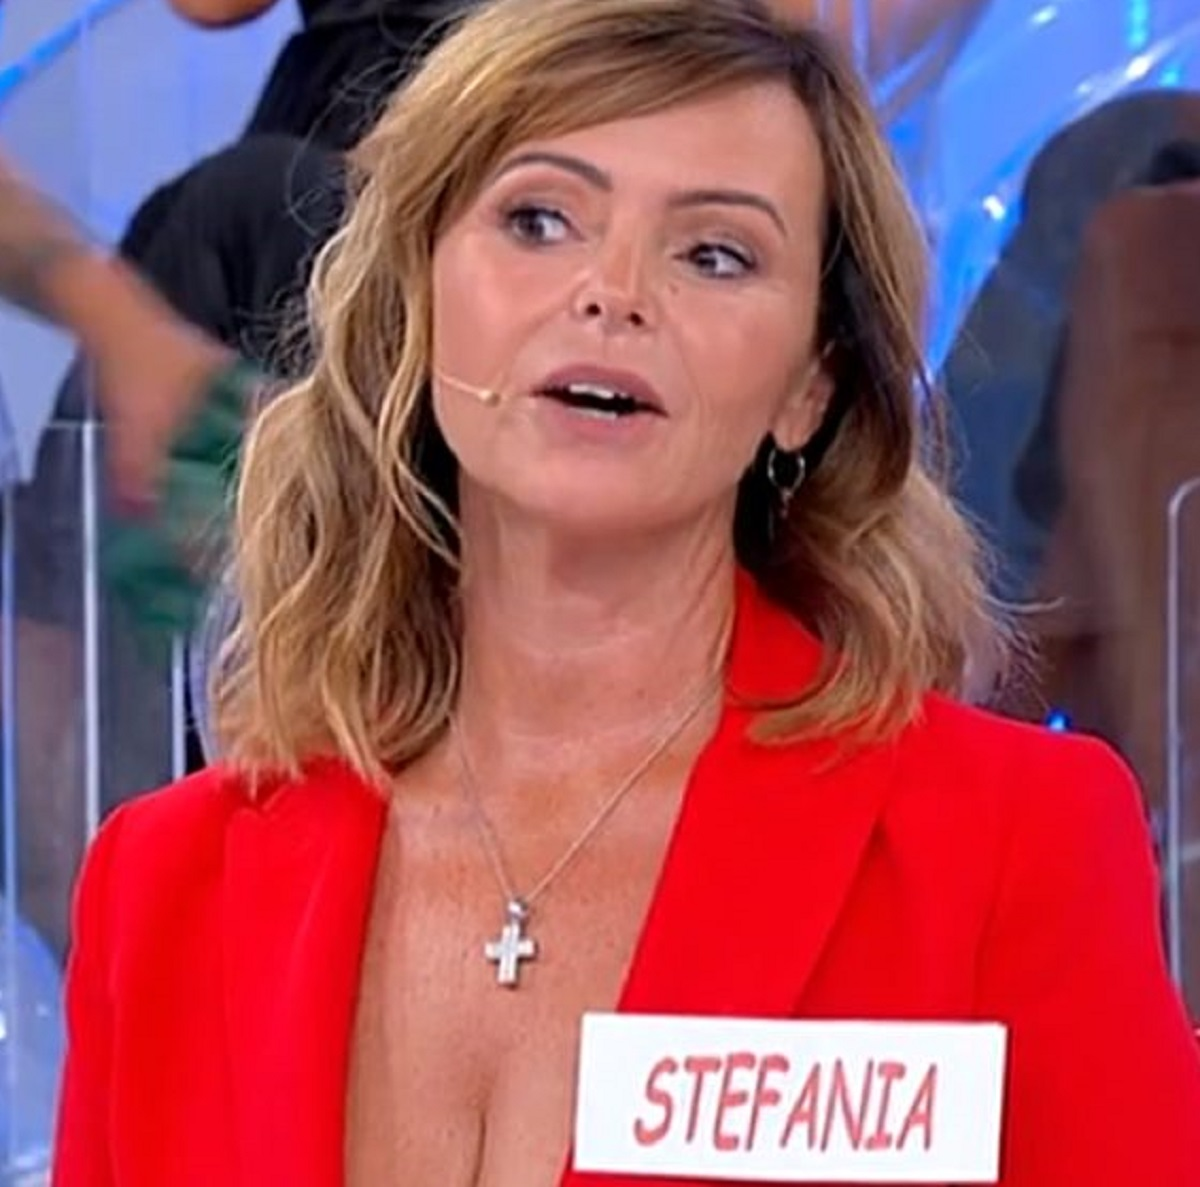 UeD Stefania Montù Alessandro Bizziato rottura motivo